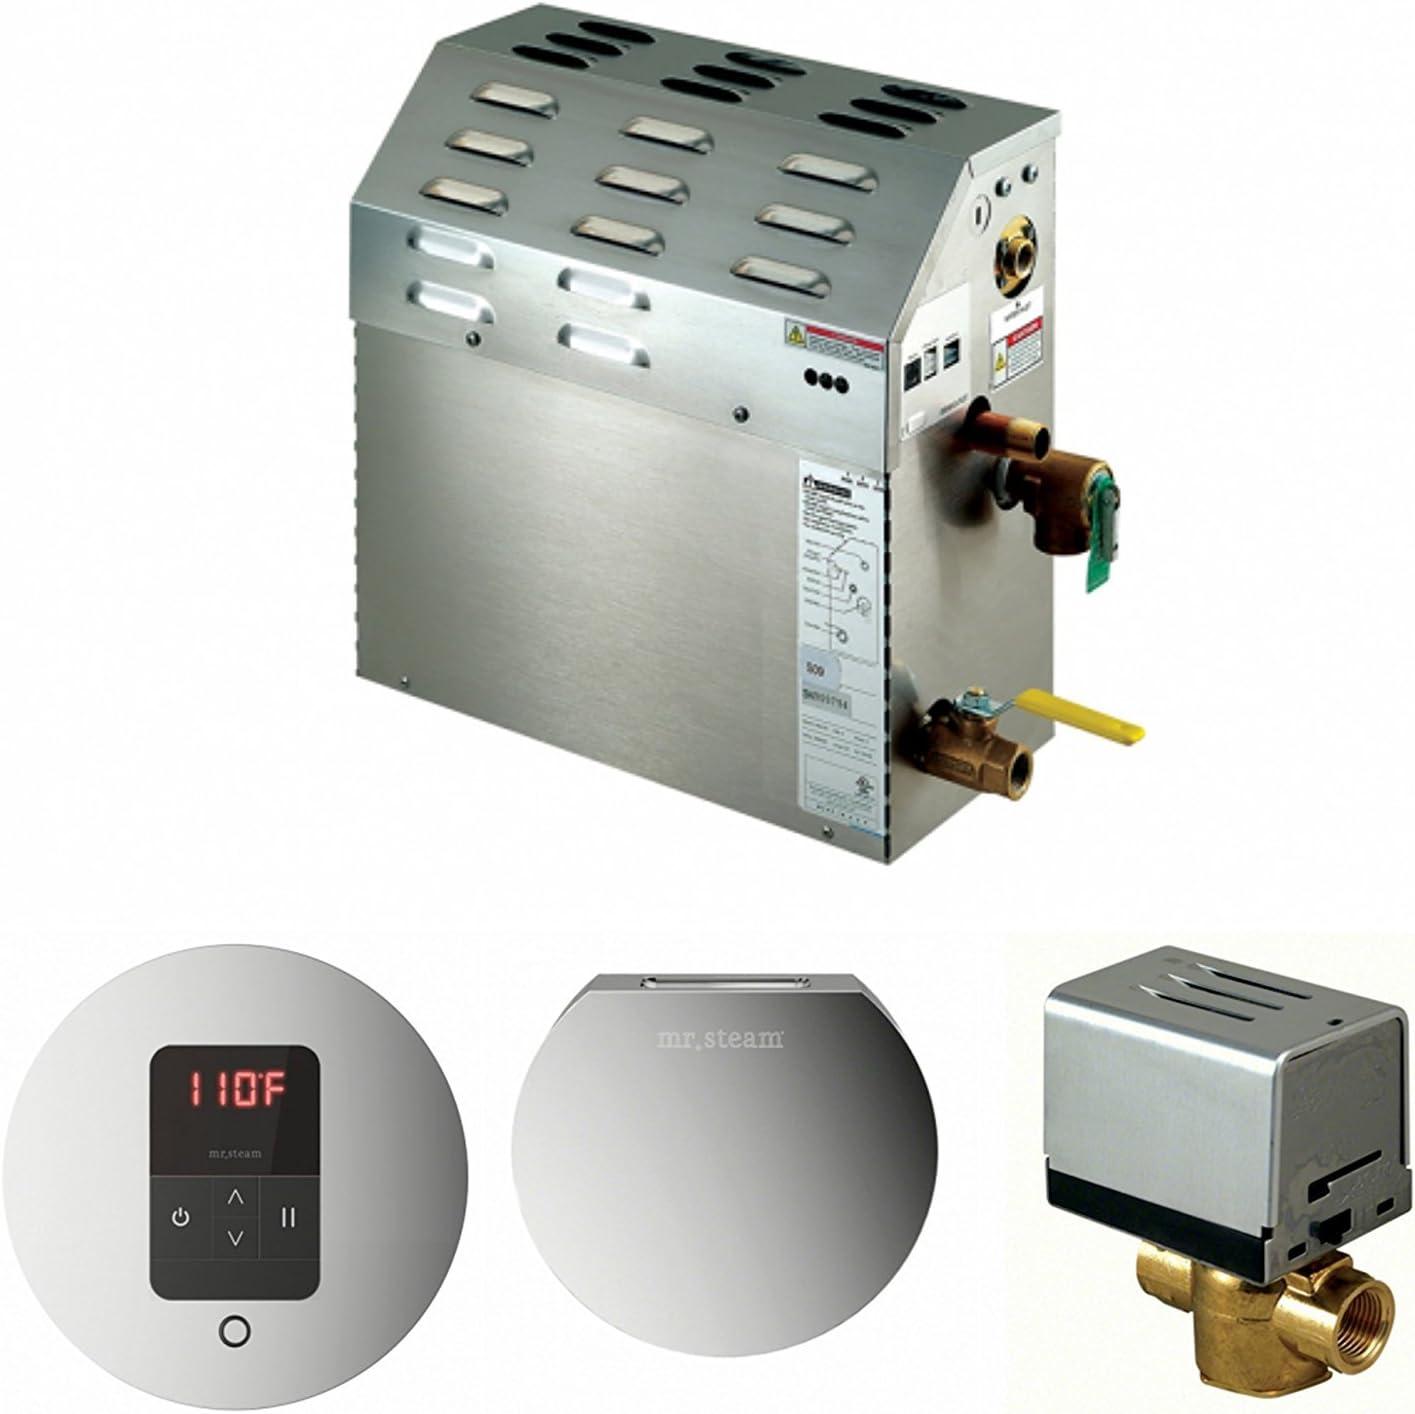 Mr Steam Bath Generators Steam Room iTempo Round Control in Polished Chrome